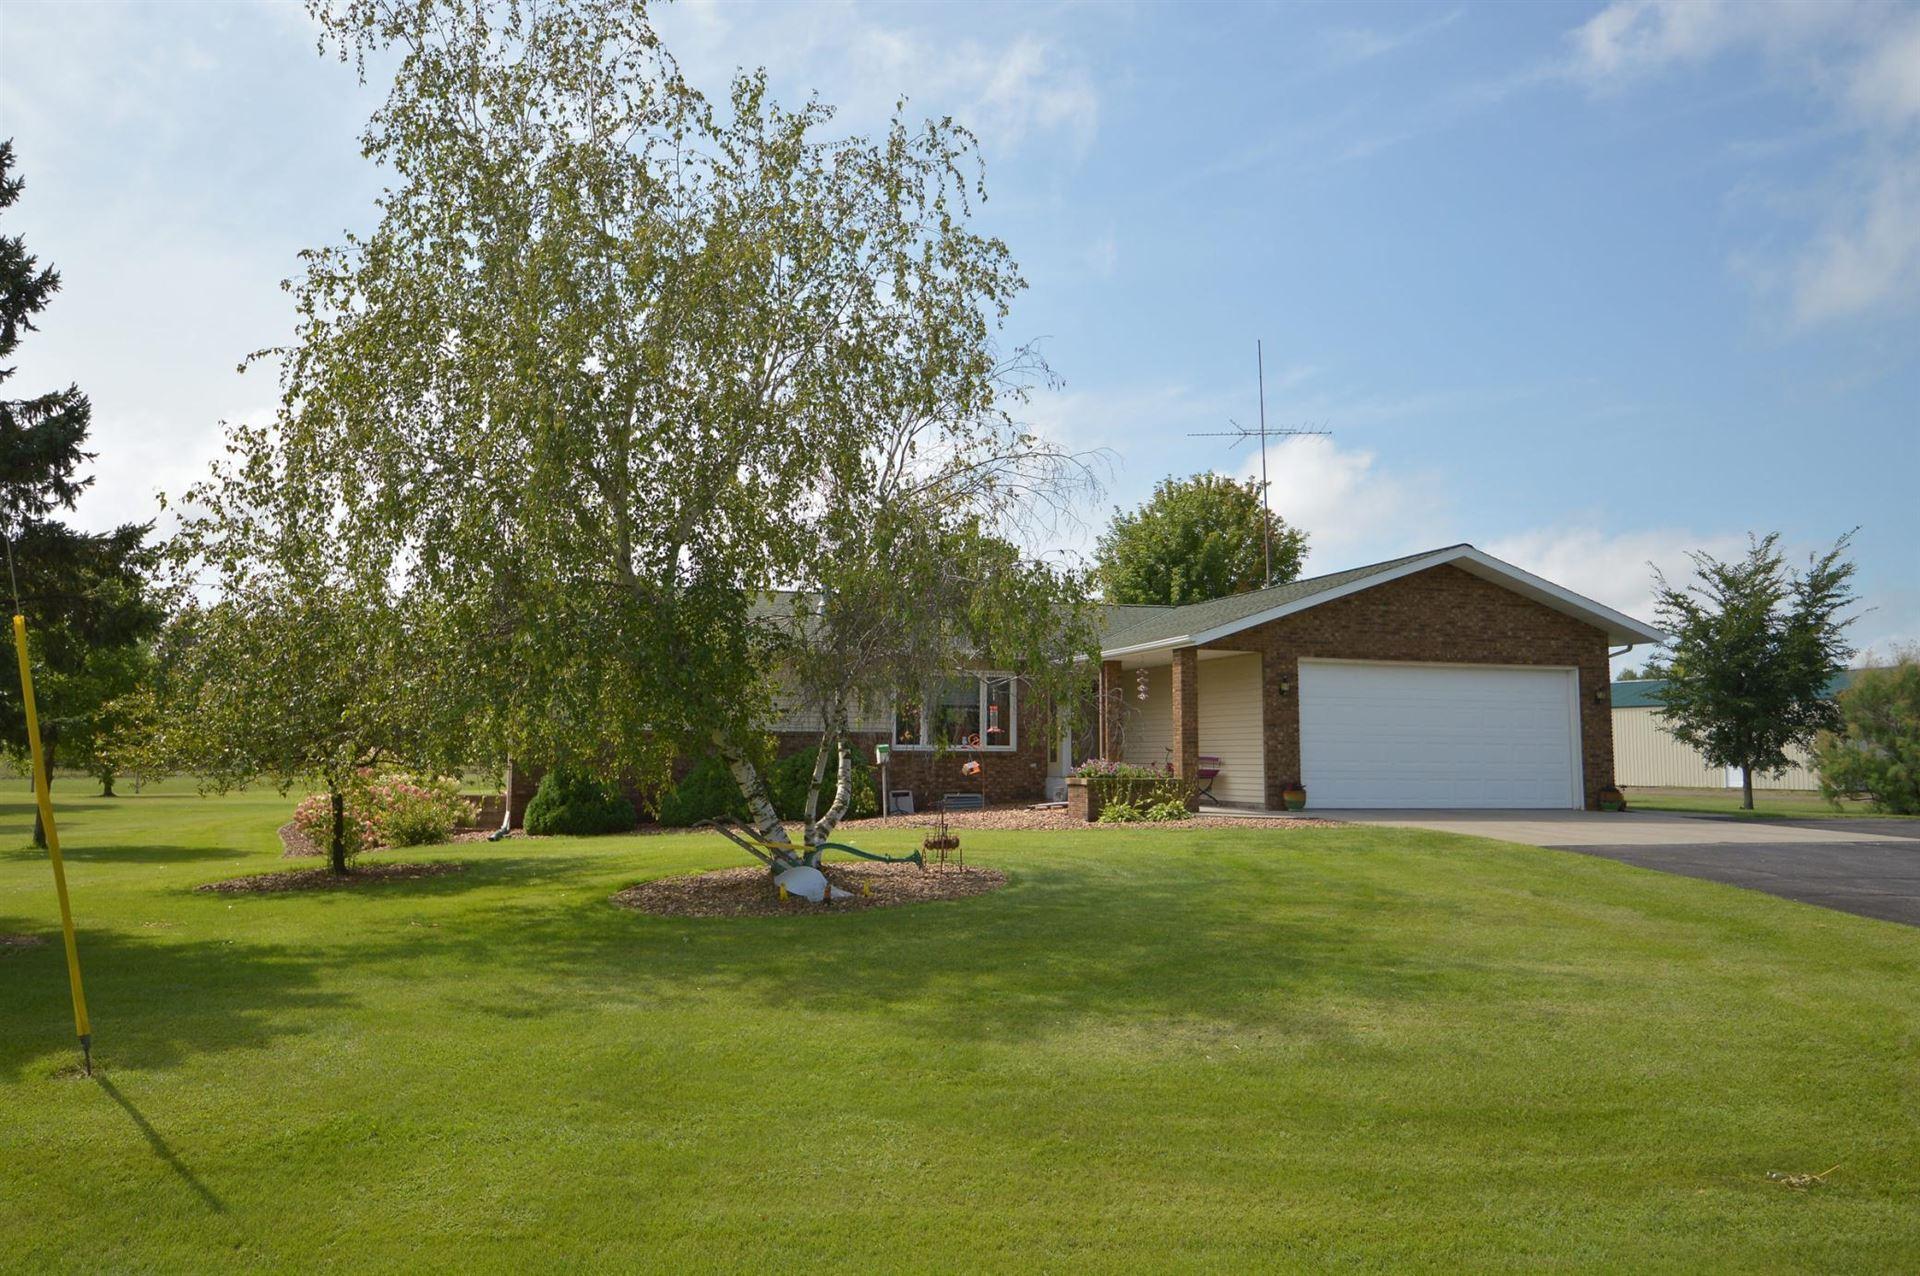 5525 Prairie Grass Drive, Sartell, MN 56377 - #: 6093548